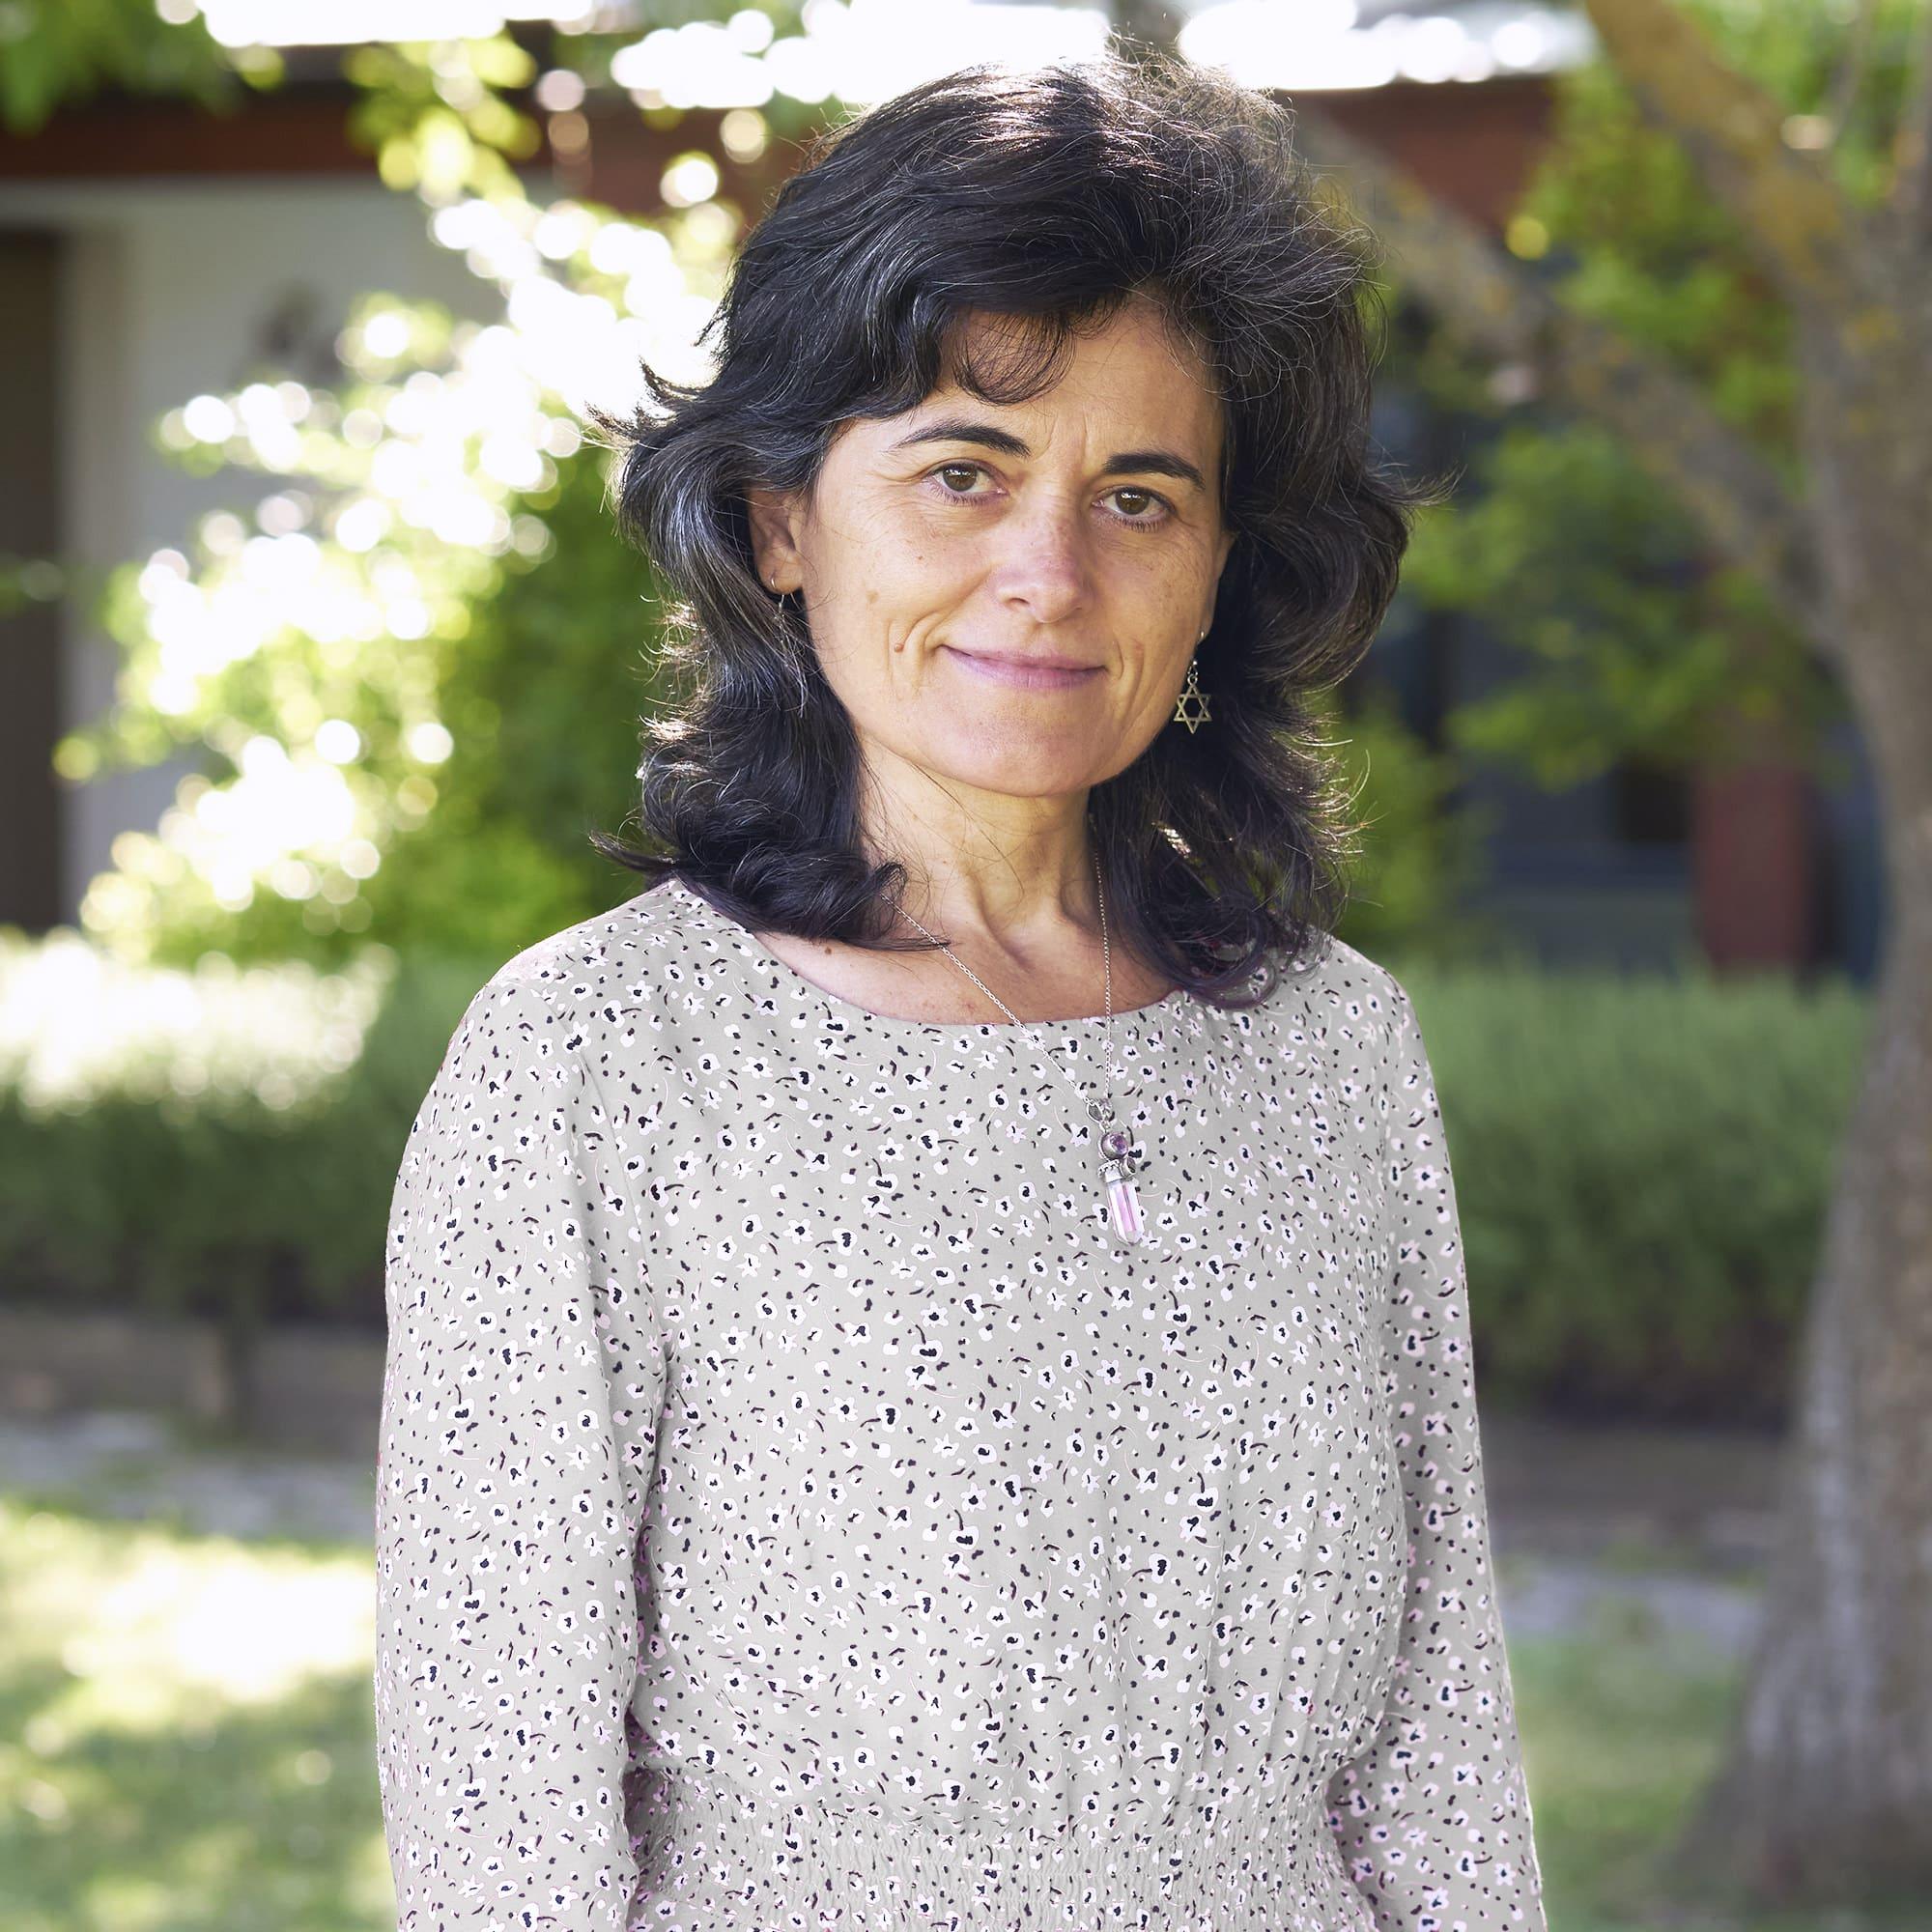 Dra. Salud Arroyo Hernández